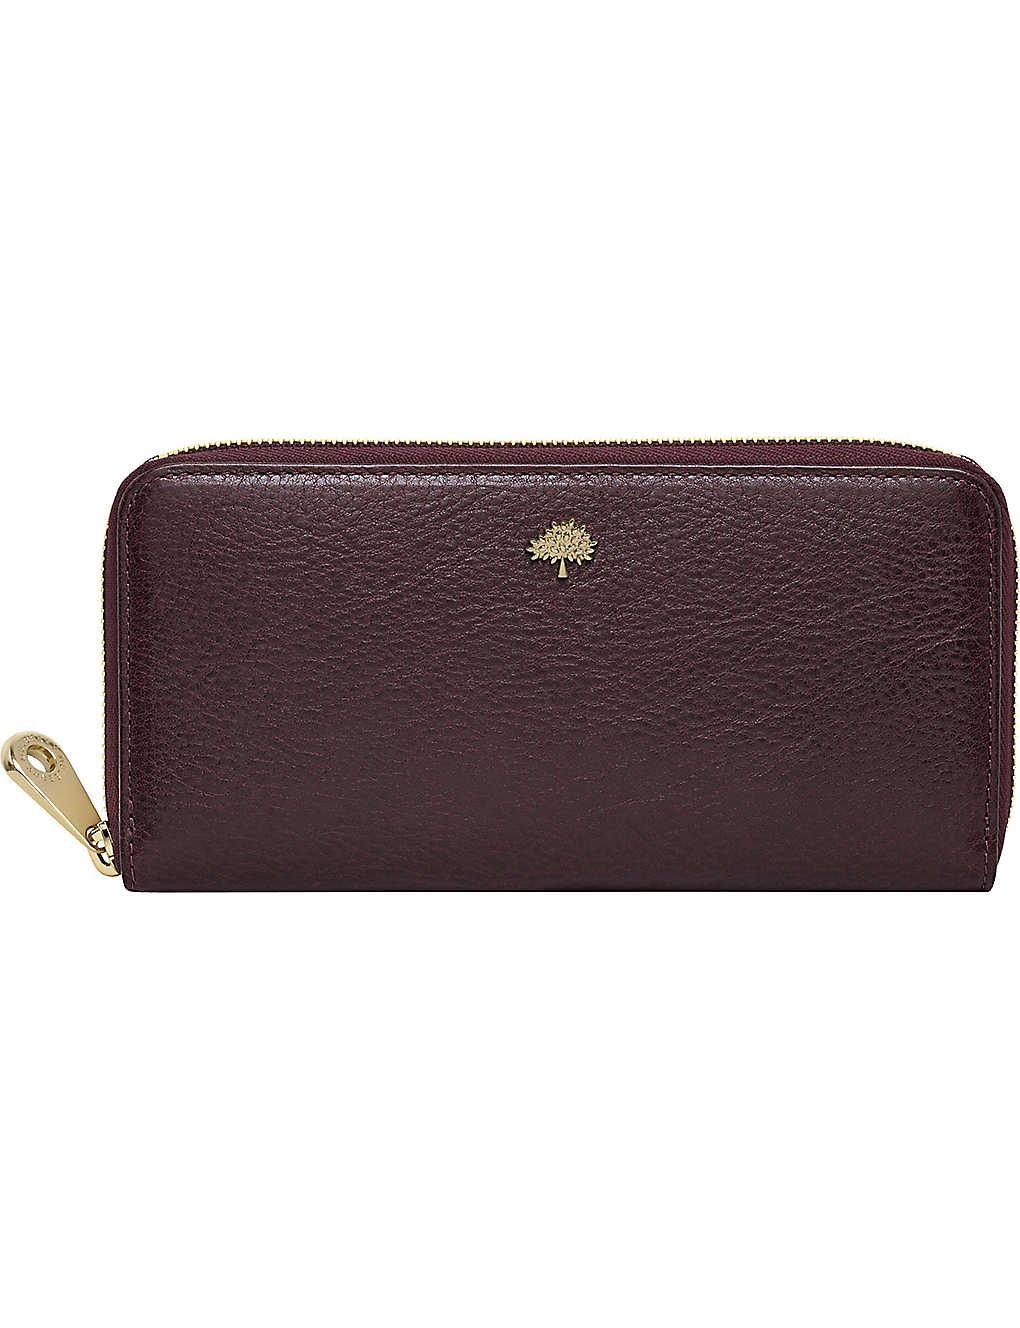 cb1cb21665 MULBERRY - Tree glossy goat leather wallet | Selfridges.com